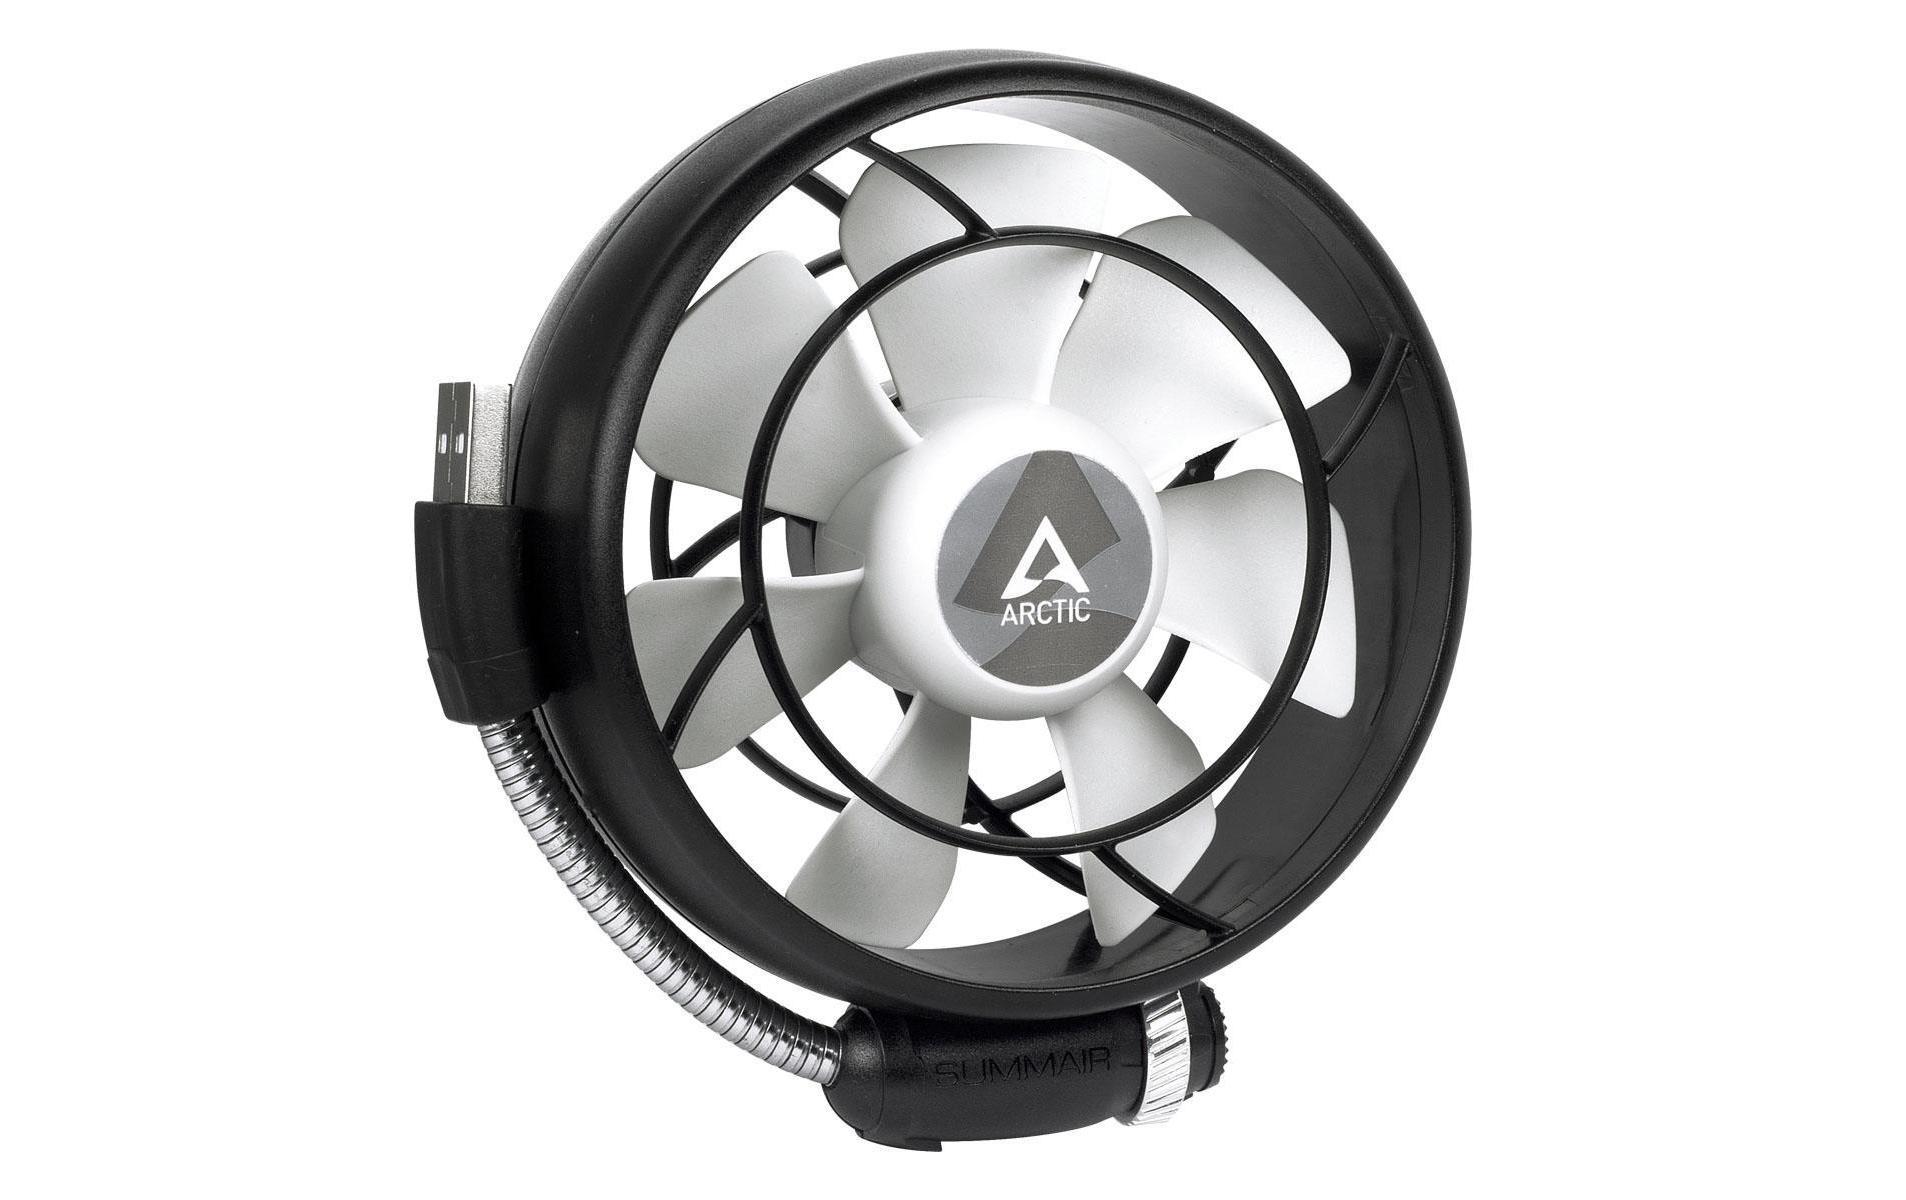 Image of USB-Ventilator, ARCTIC COOLING, »Summair Light, Schwarz, Weiss«